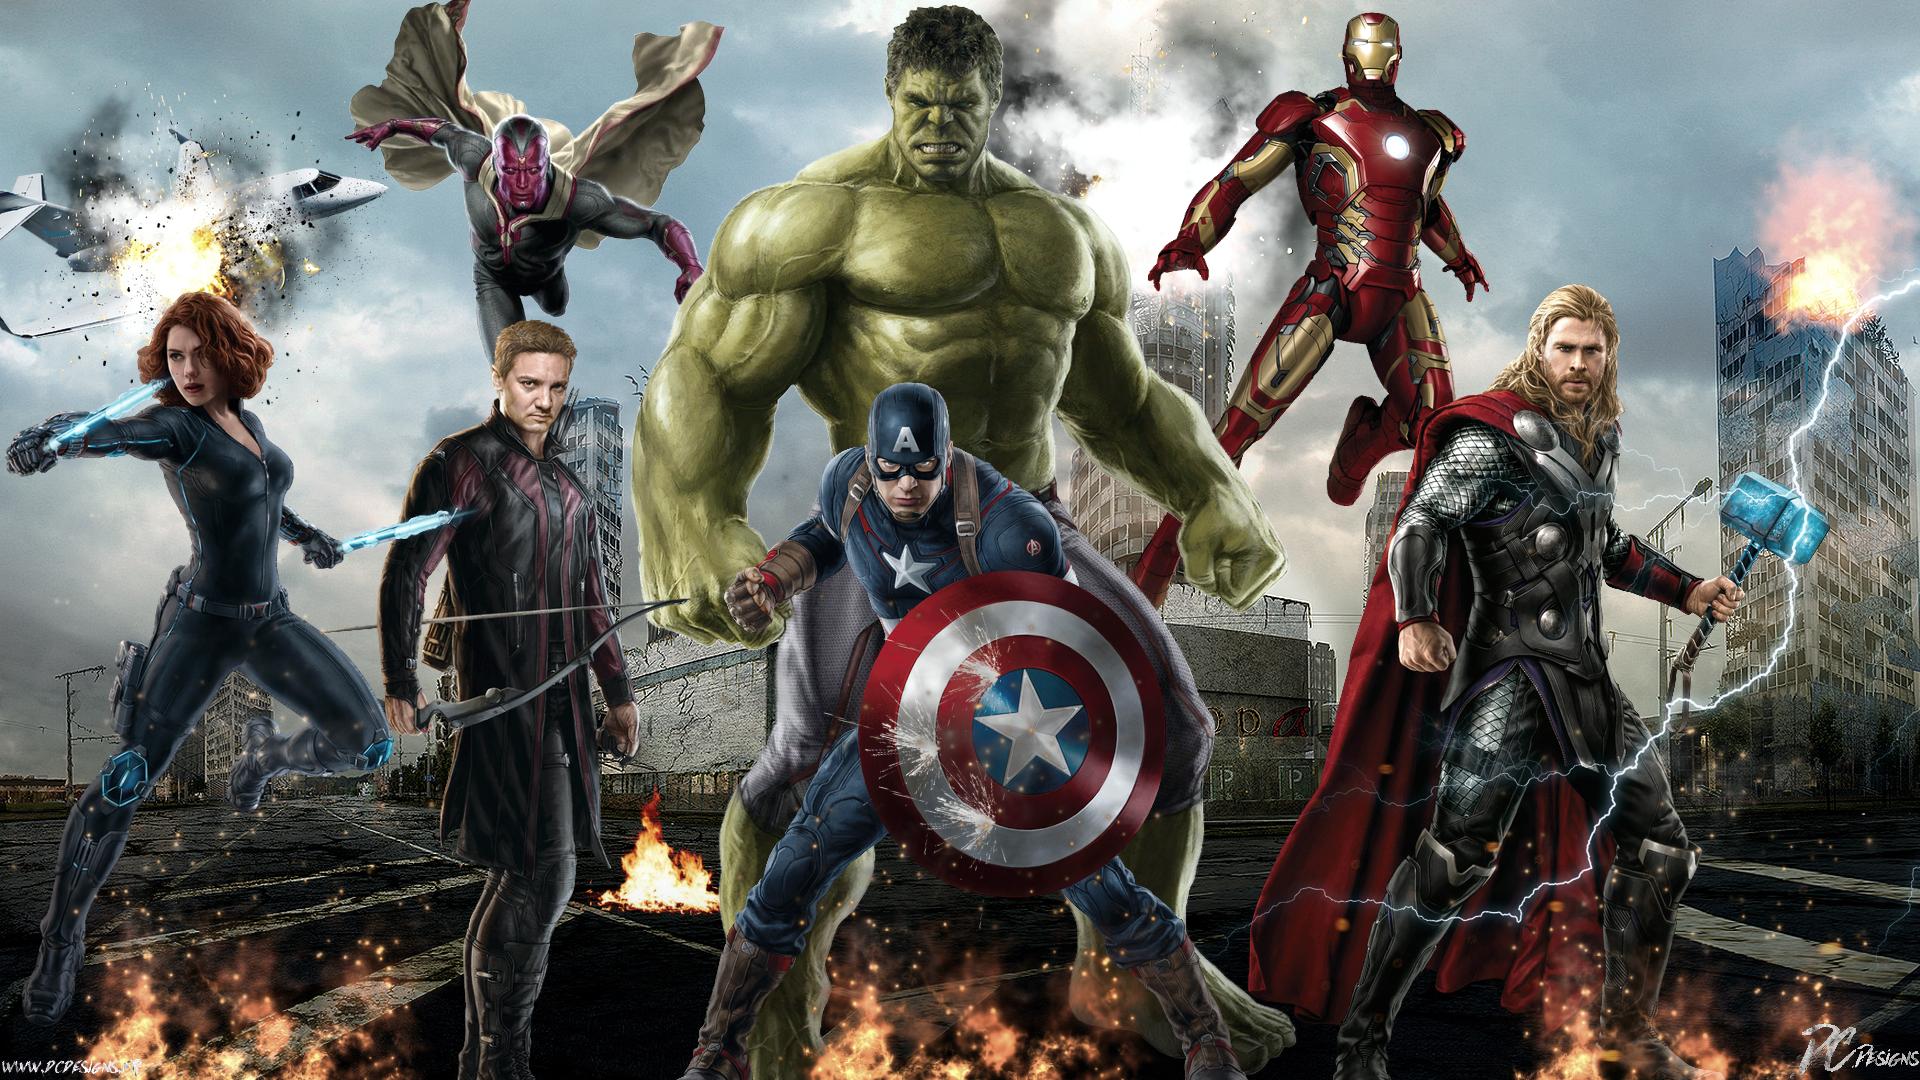 1080p Avengers Images Hd 1920x1080 Wallpaper Teahub Io